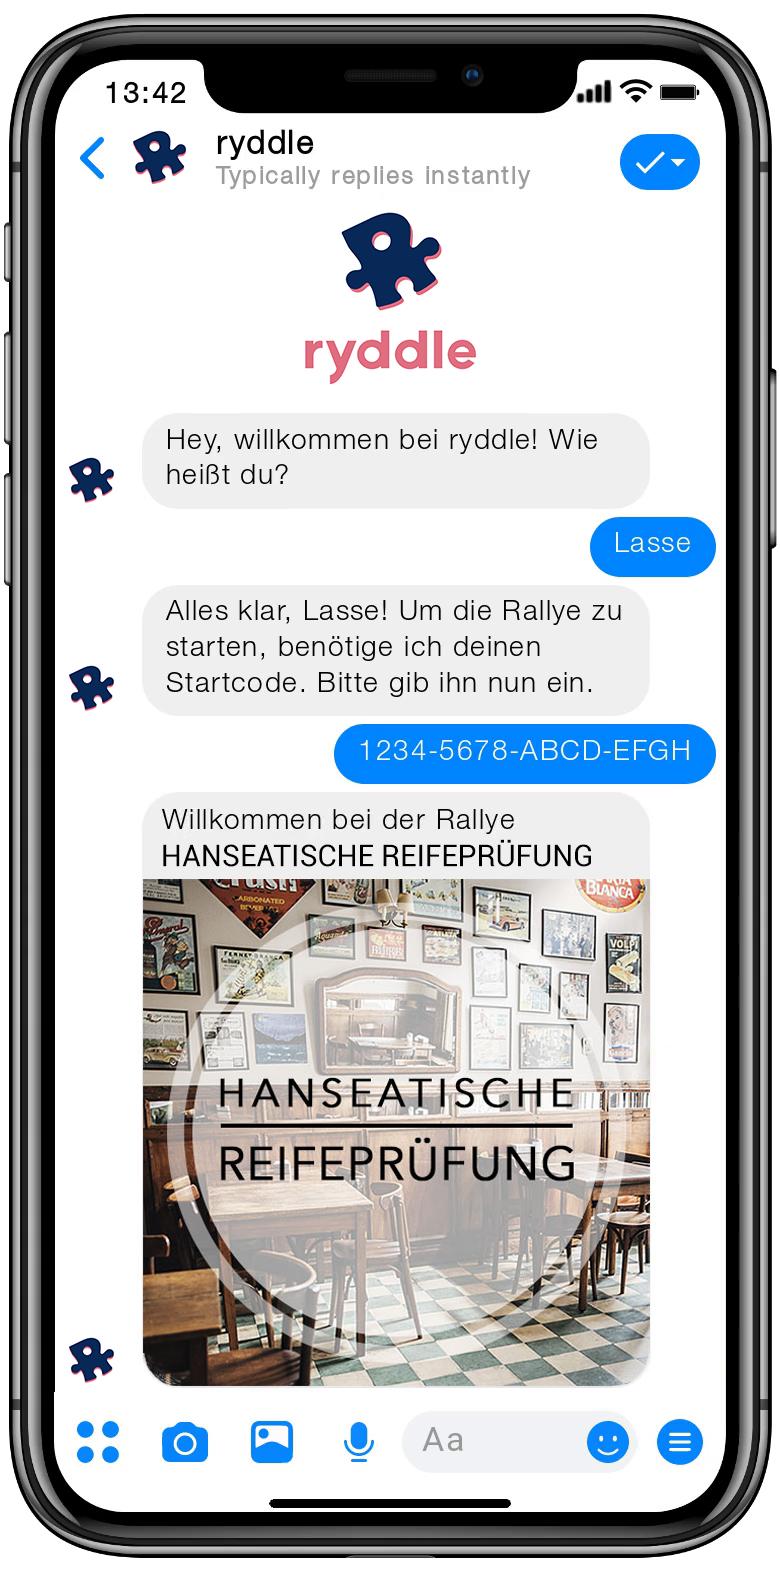 Stadtrallye Rostock - Vorschau der Smartphone Schnitzeljagd